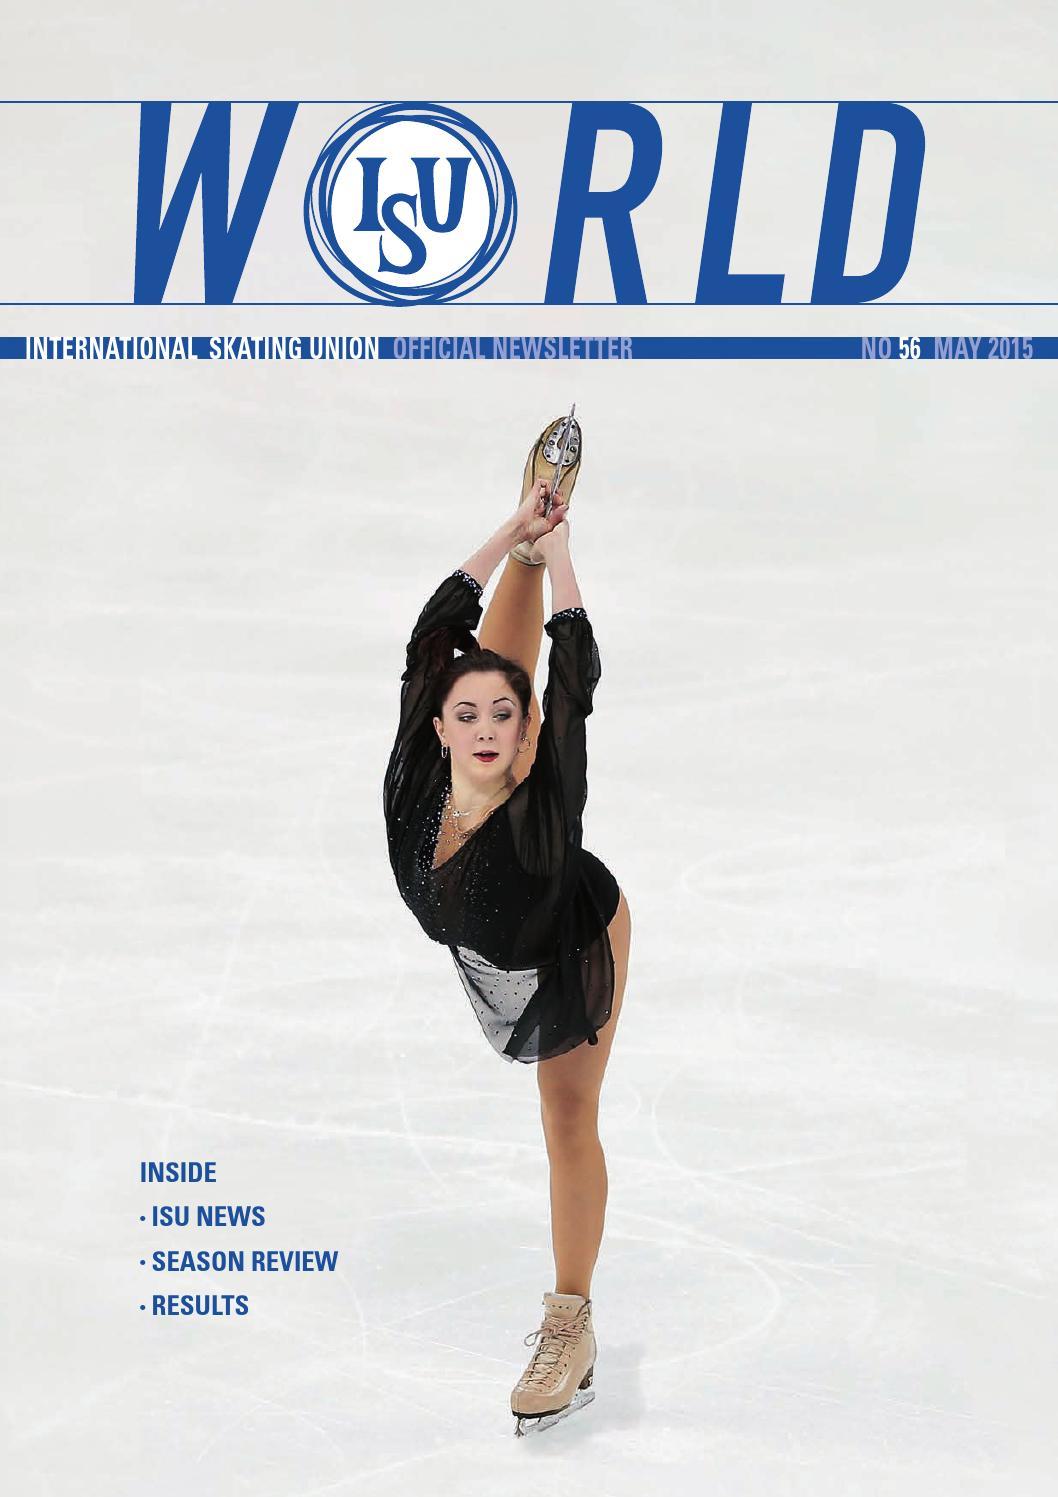 ISU World No  56 May 2015 by International Skating Union - issuu